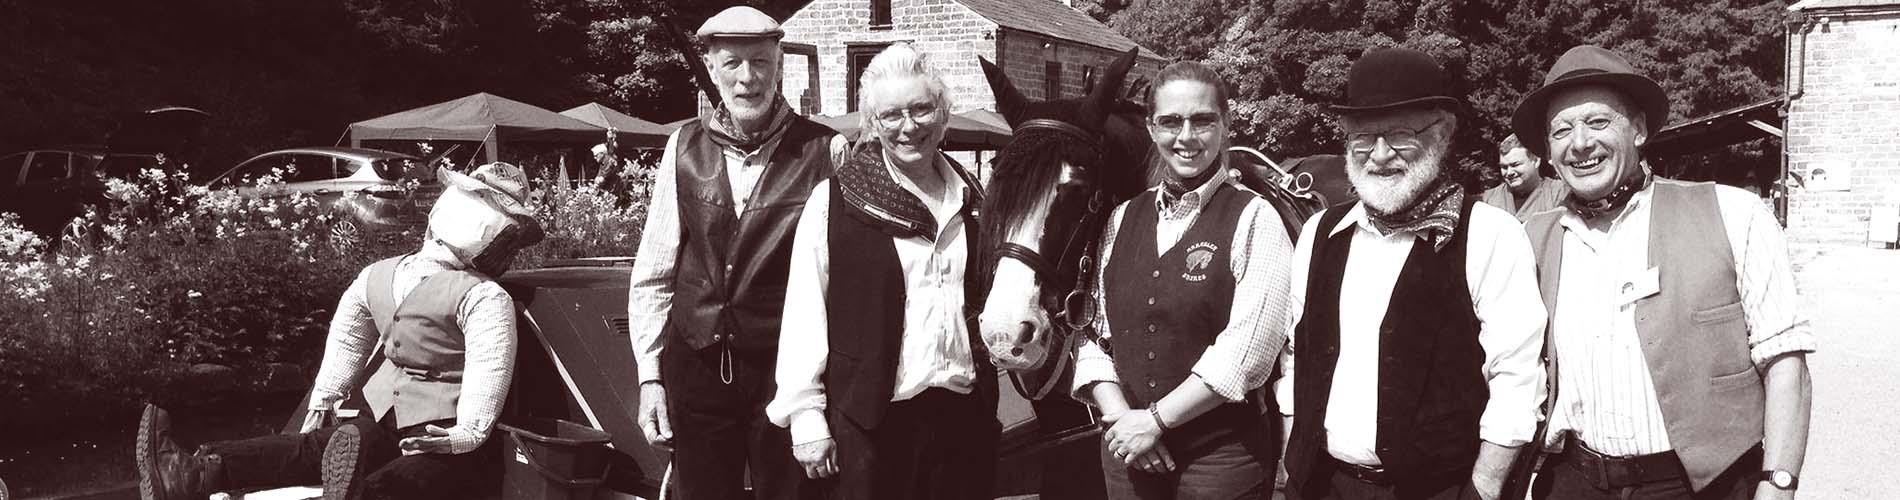 Volunteers at Birdswood, Cromford Canal, Derbyshire